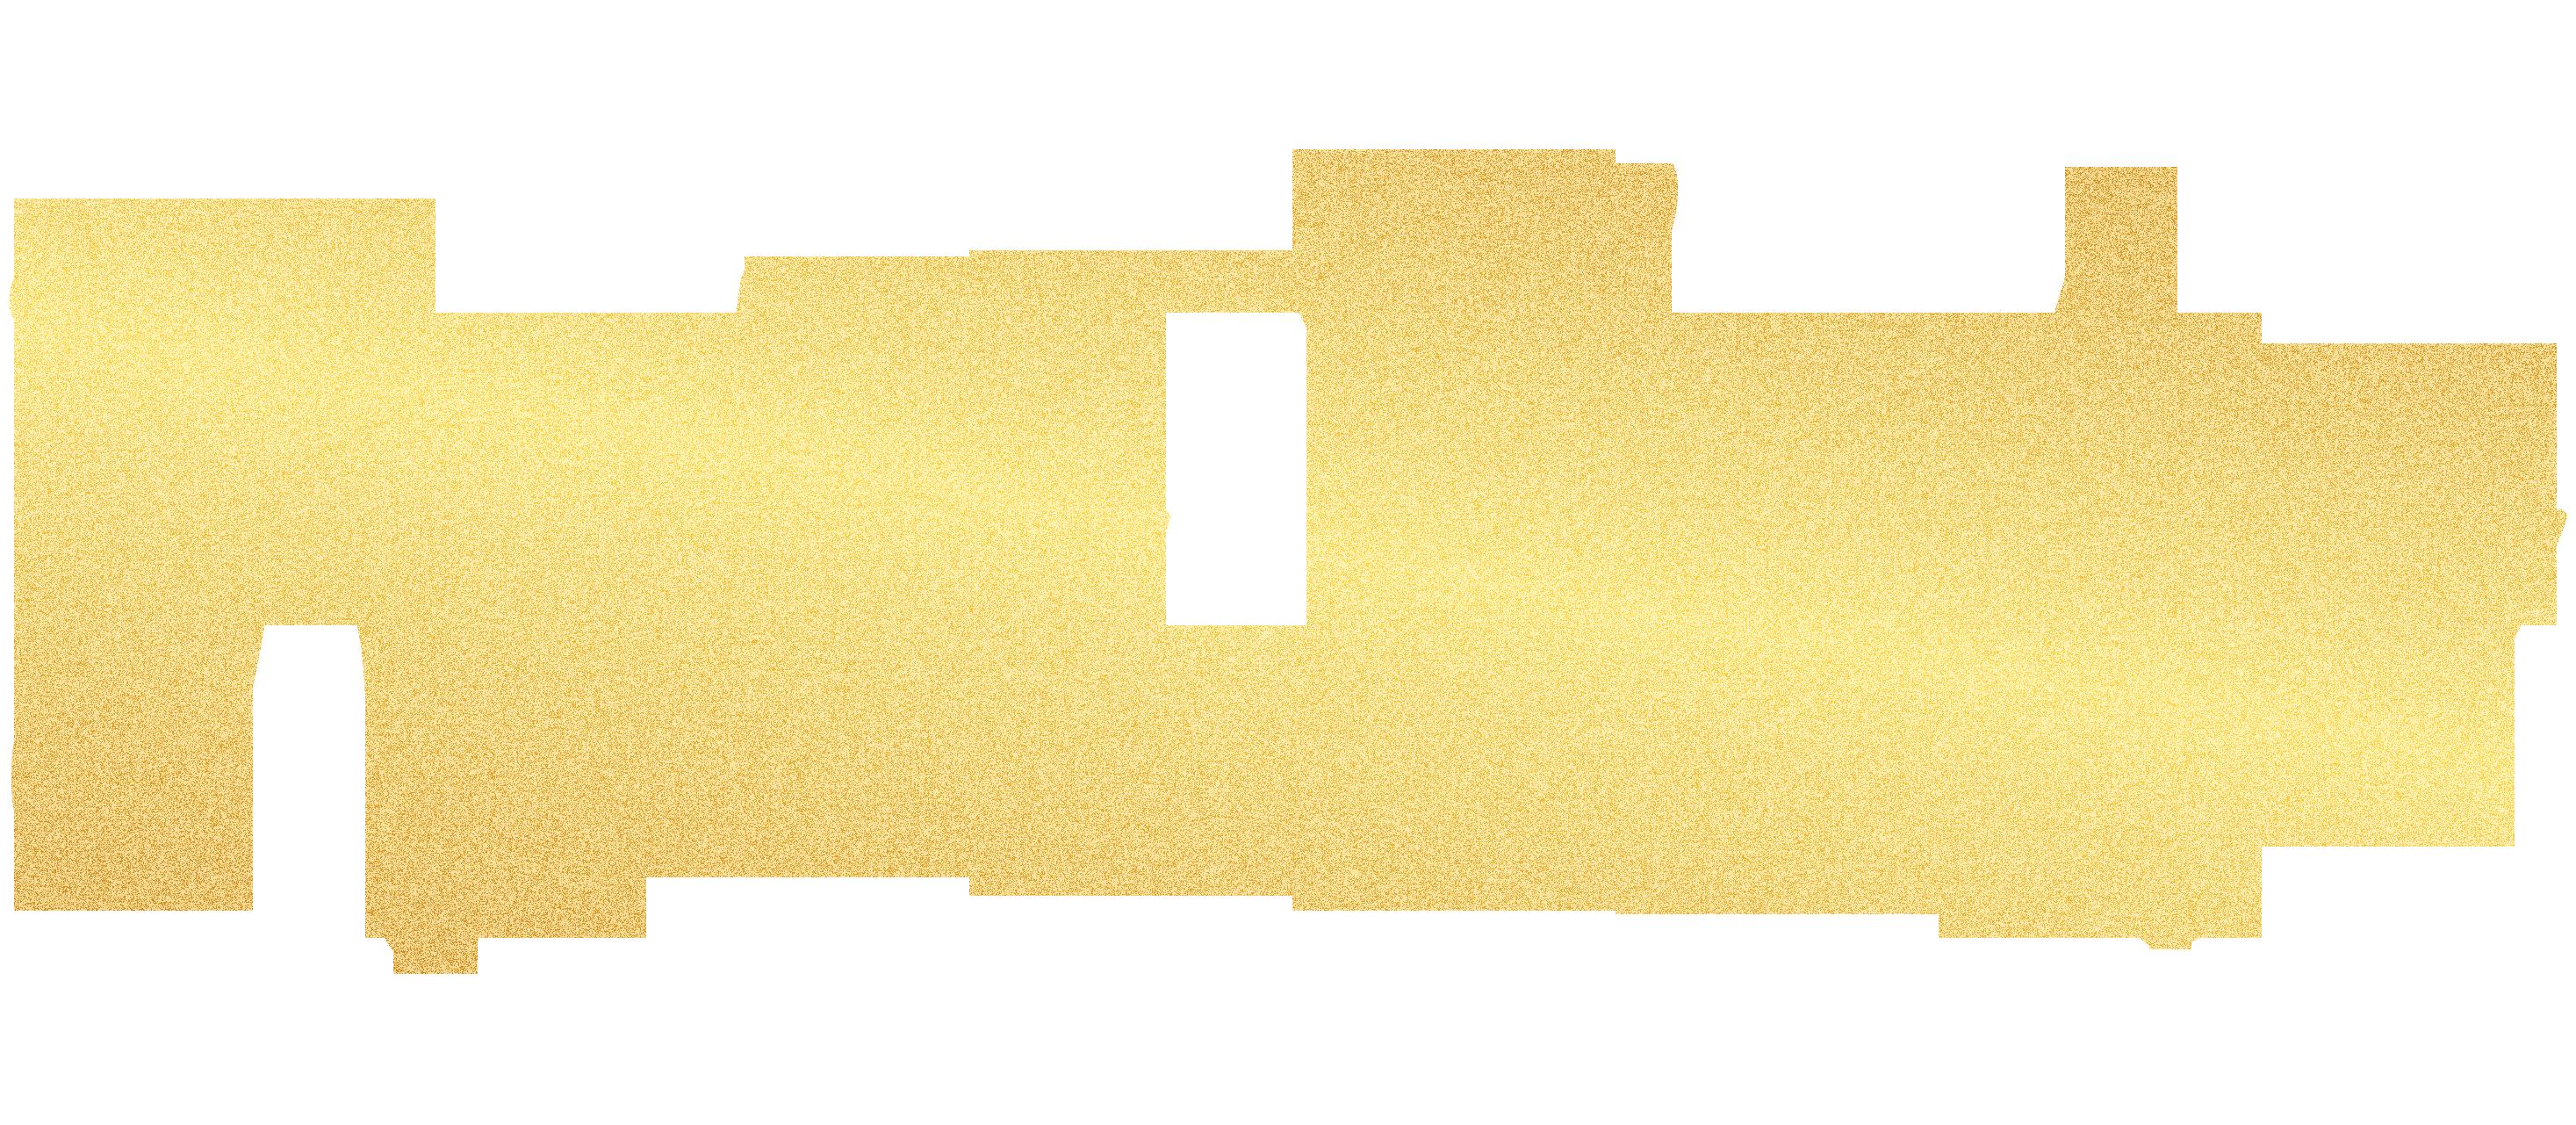 Ruthkudzicoaching Logo